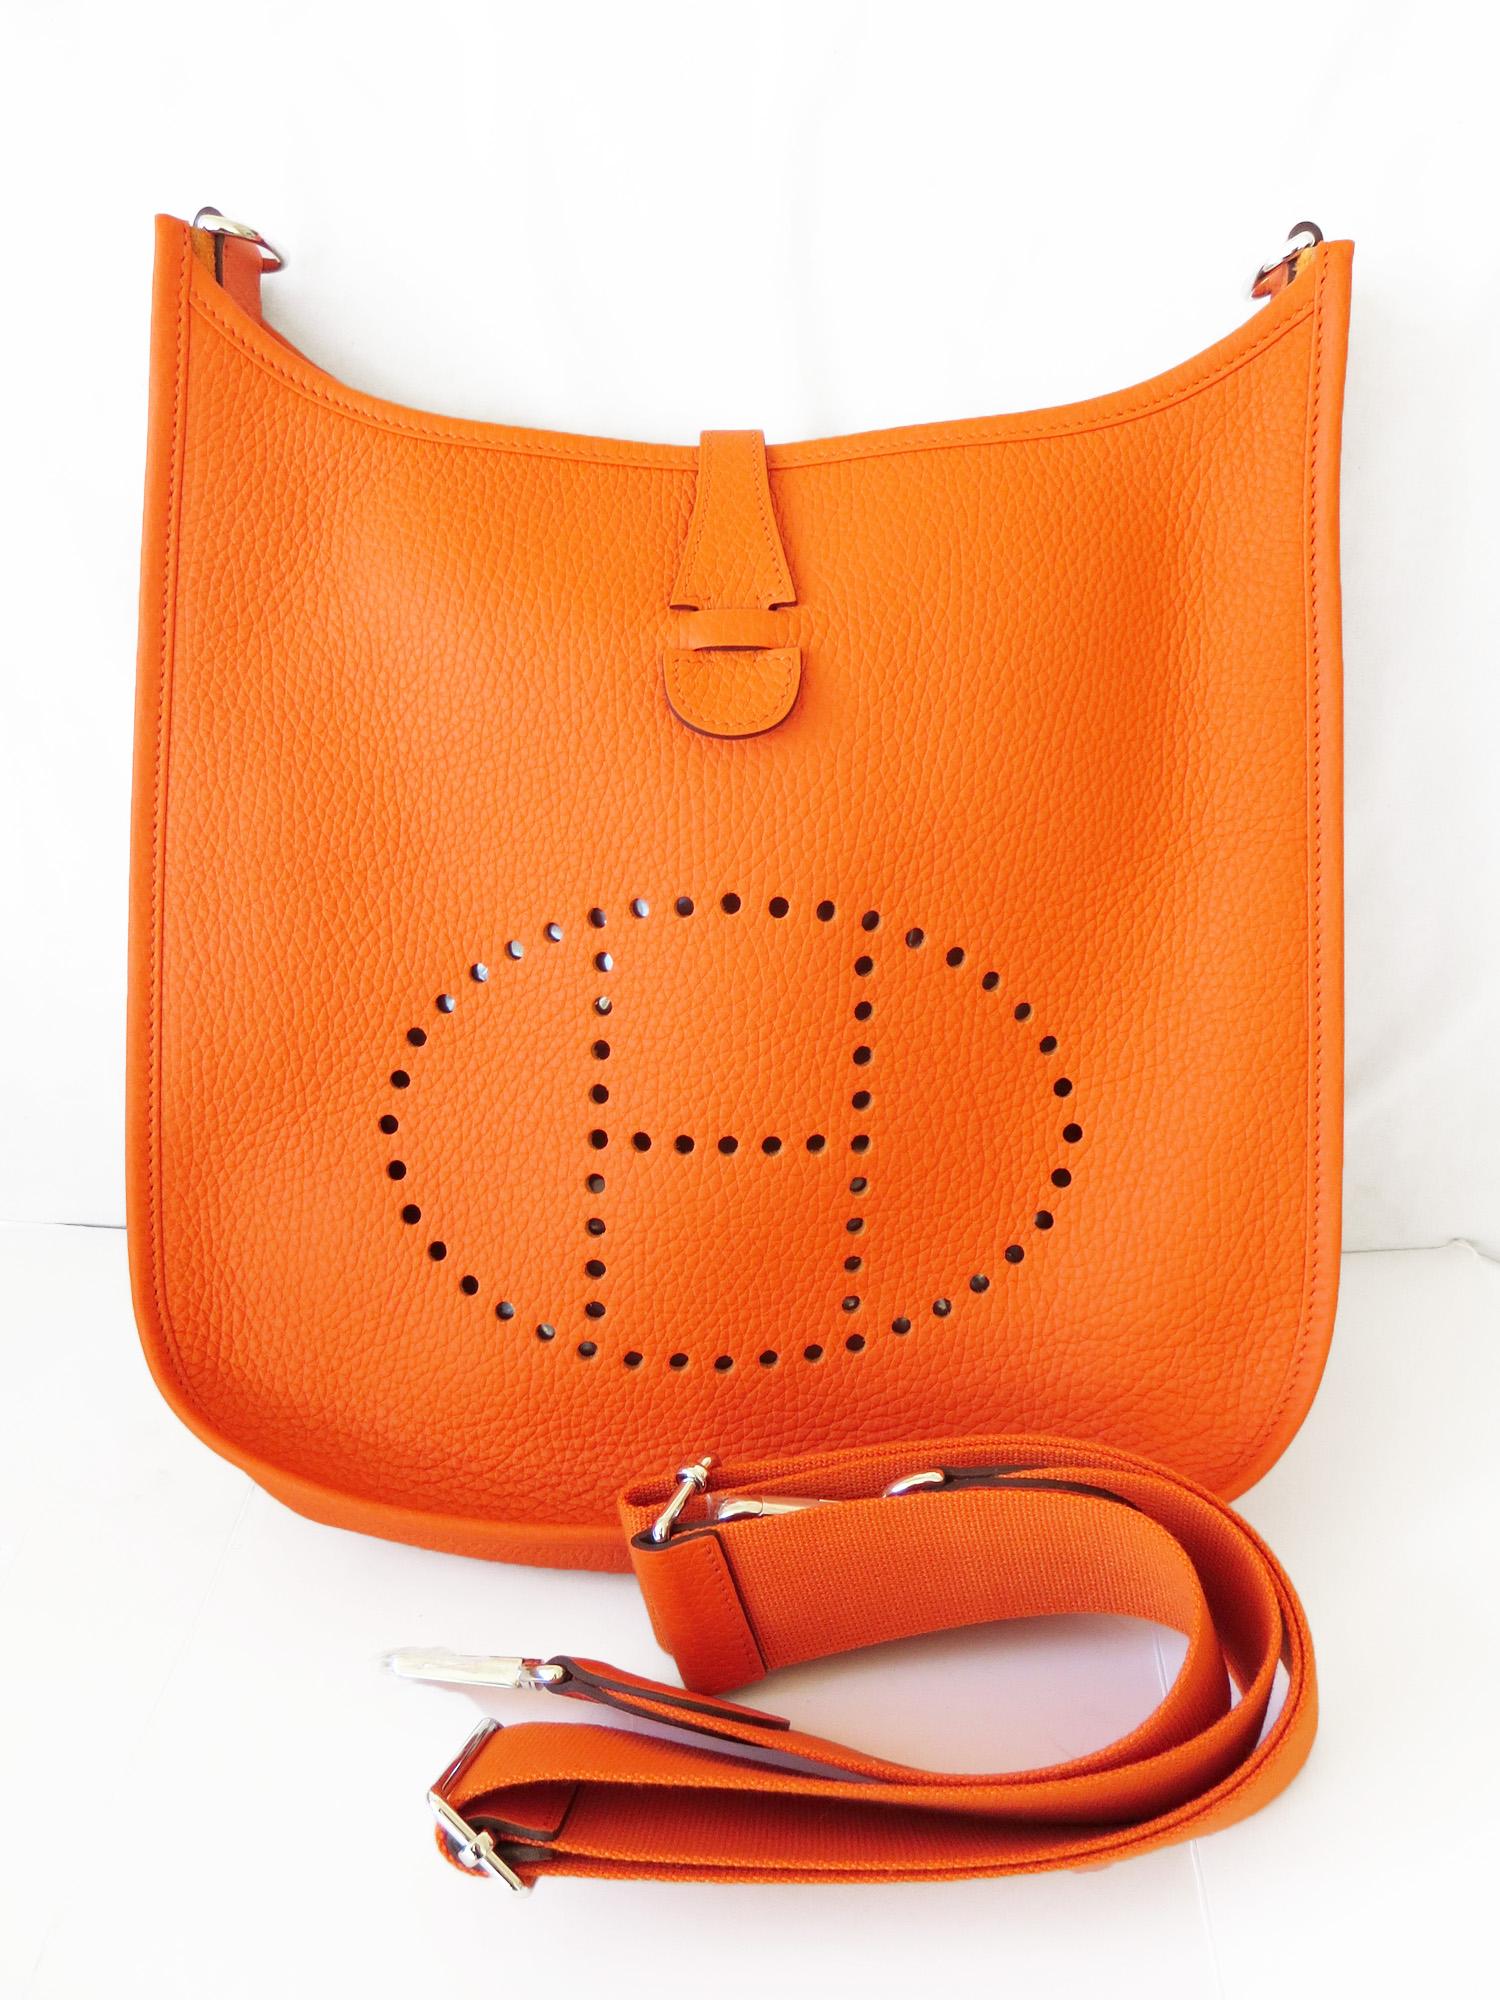 9c0521c489e6 2014 New AUTHENTIC Hermes Evelyne Feu Orange PM Cross body Shoulder bag H  logo